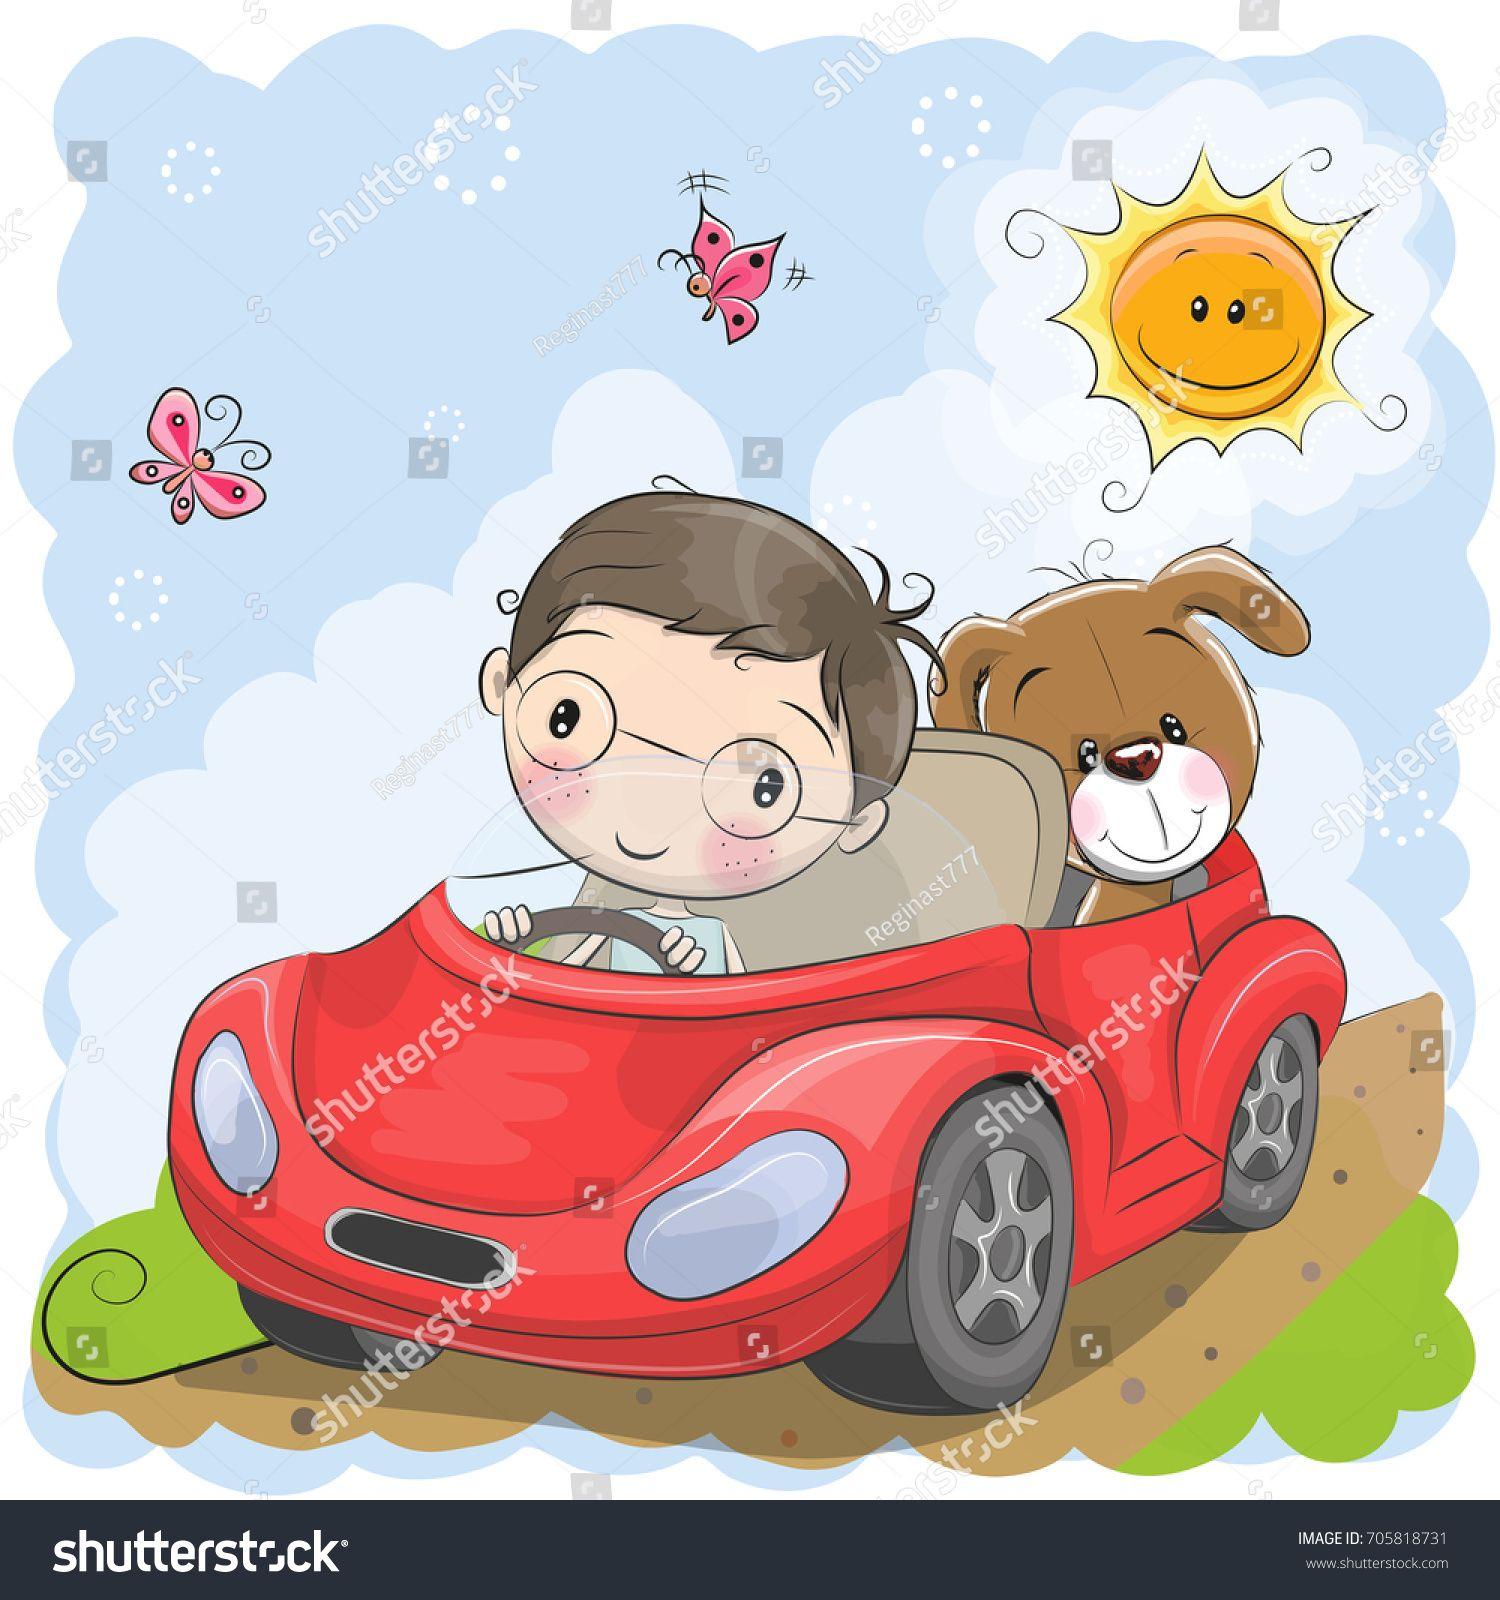 Cute Cartoon Boy Goes On A Car Con Imagenes Historieta